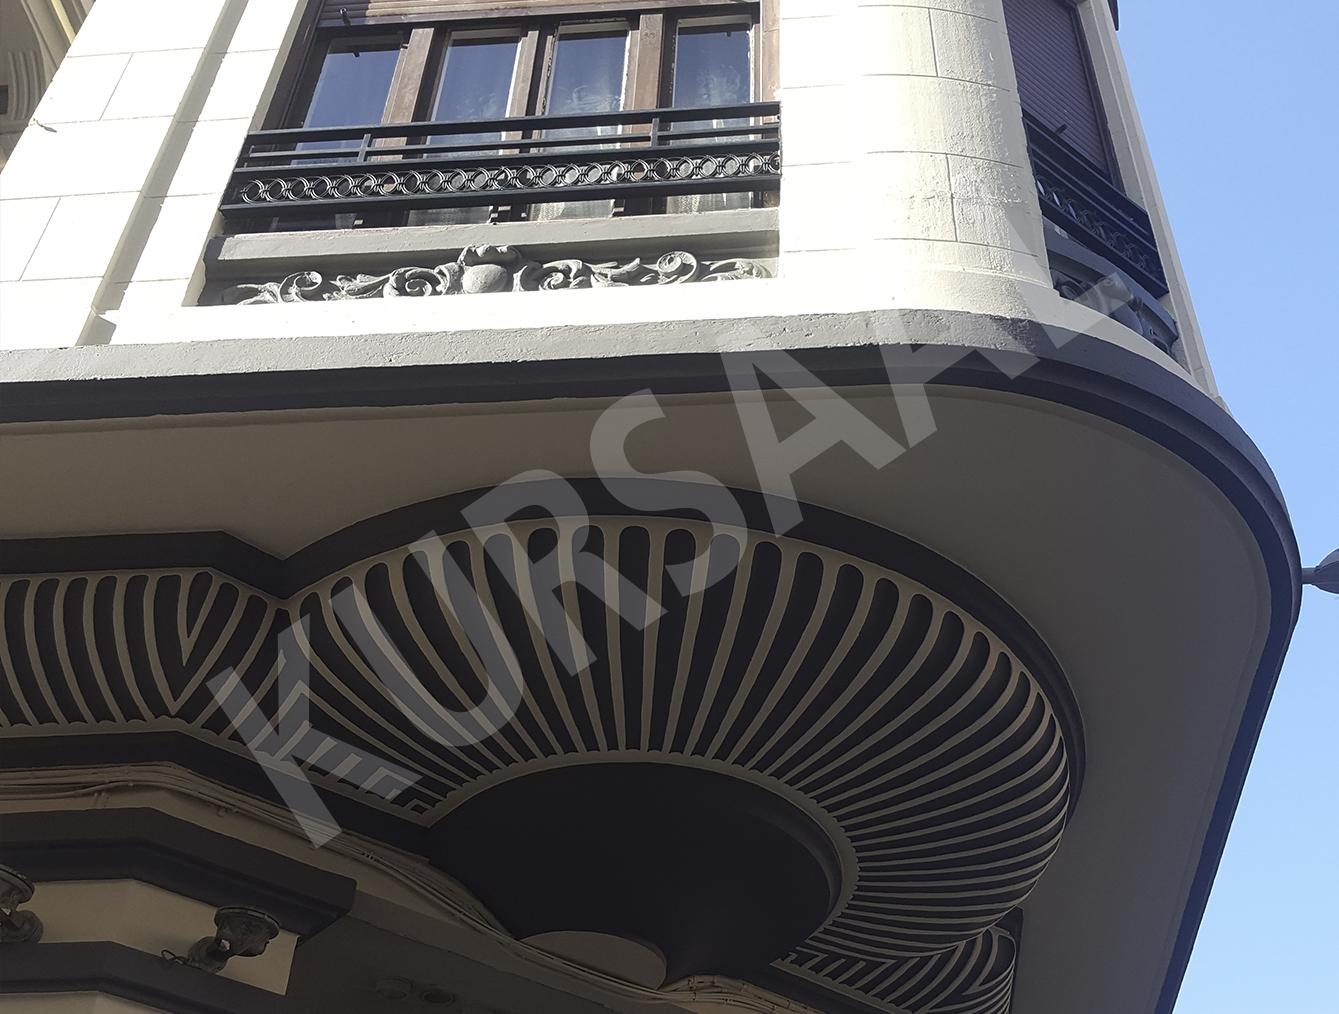 foto 12 - Restauración y patrimonio-San Francisco 5-DONOSTIA, GIPUZKOA